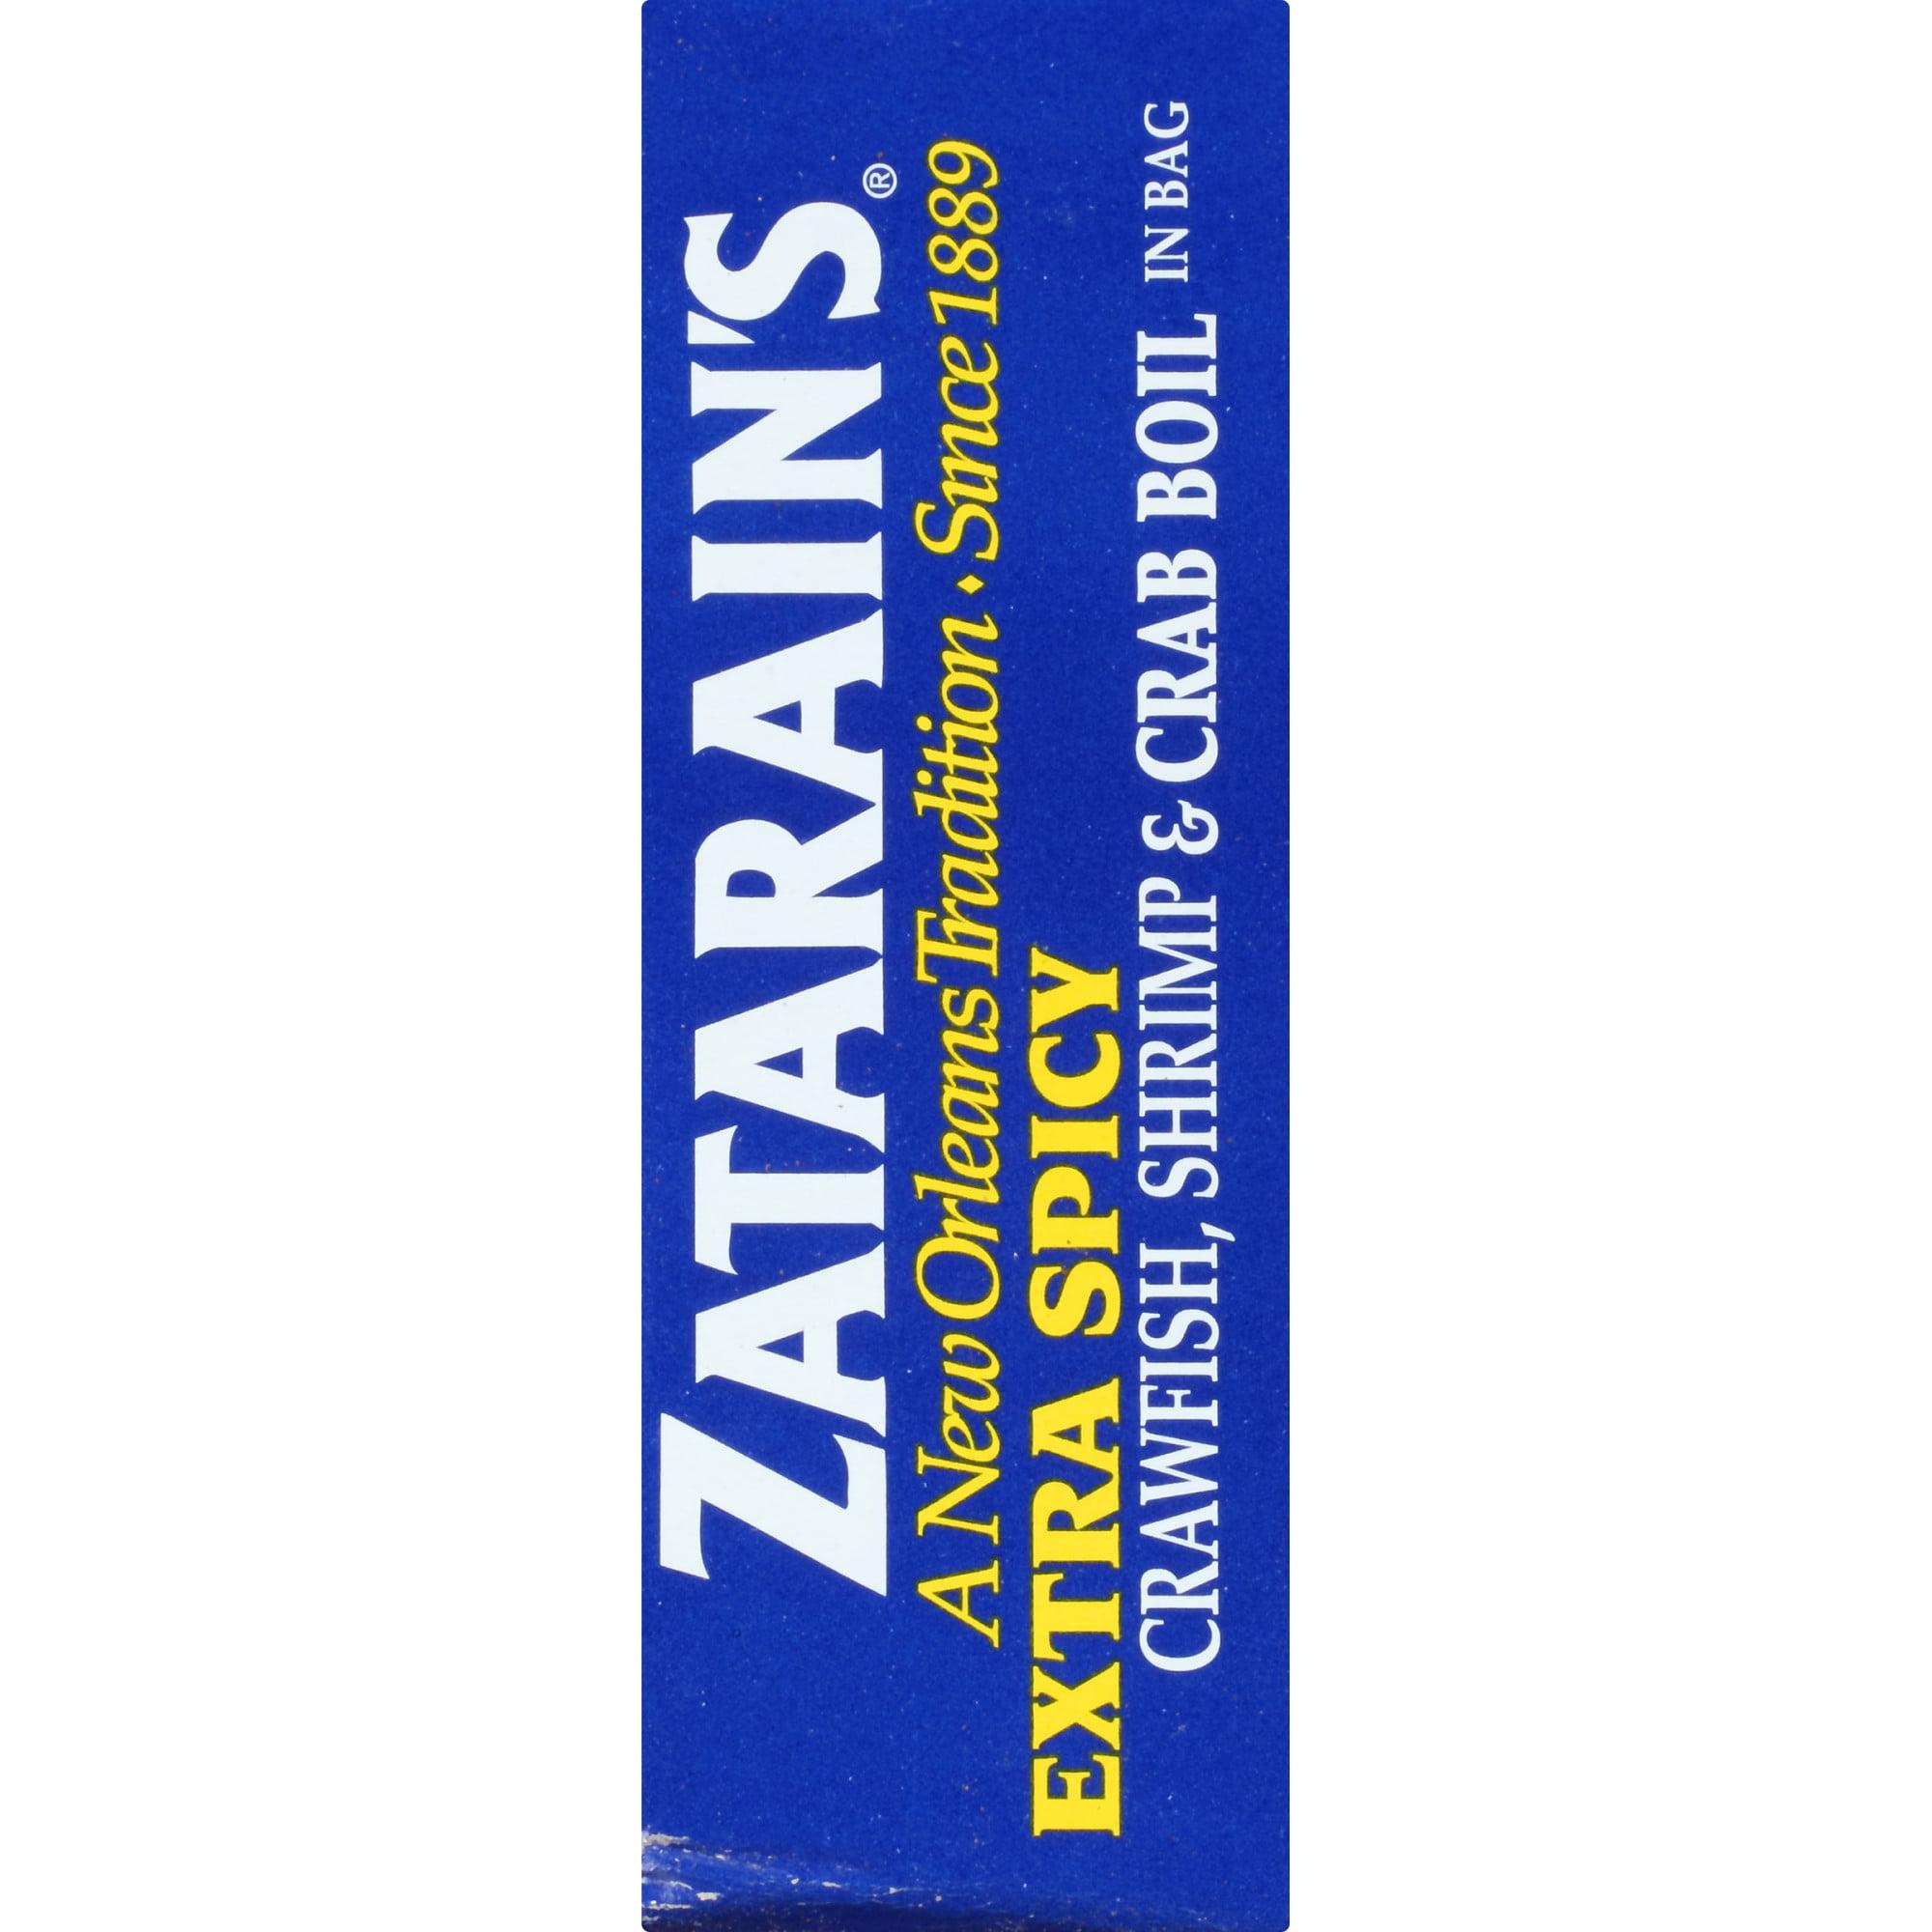 2 Pack) Zatarain's Crawfish Shrimp & Crab Boil Extra Spicy Seasoning In  Bag, 3 oz - Walmart.com - Walmart.com